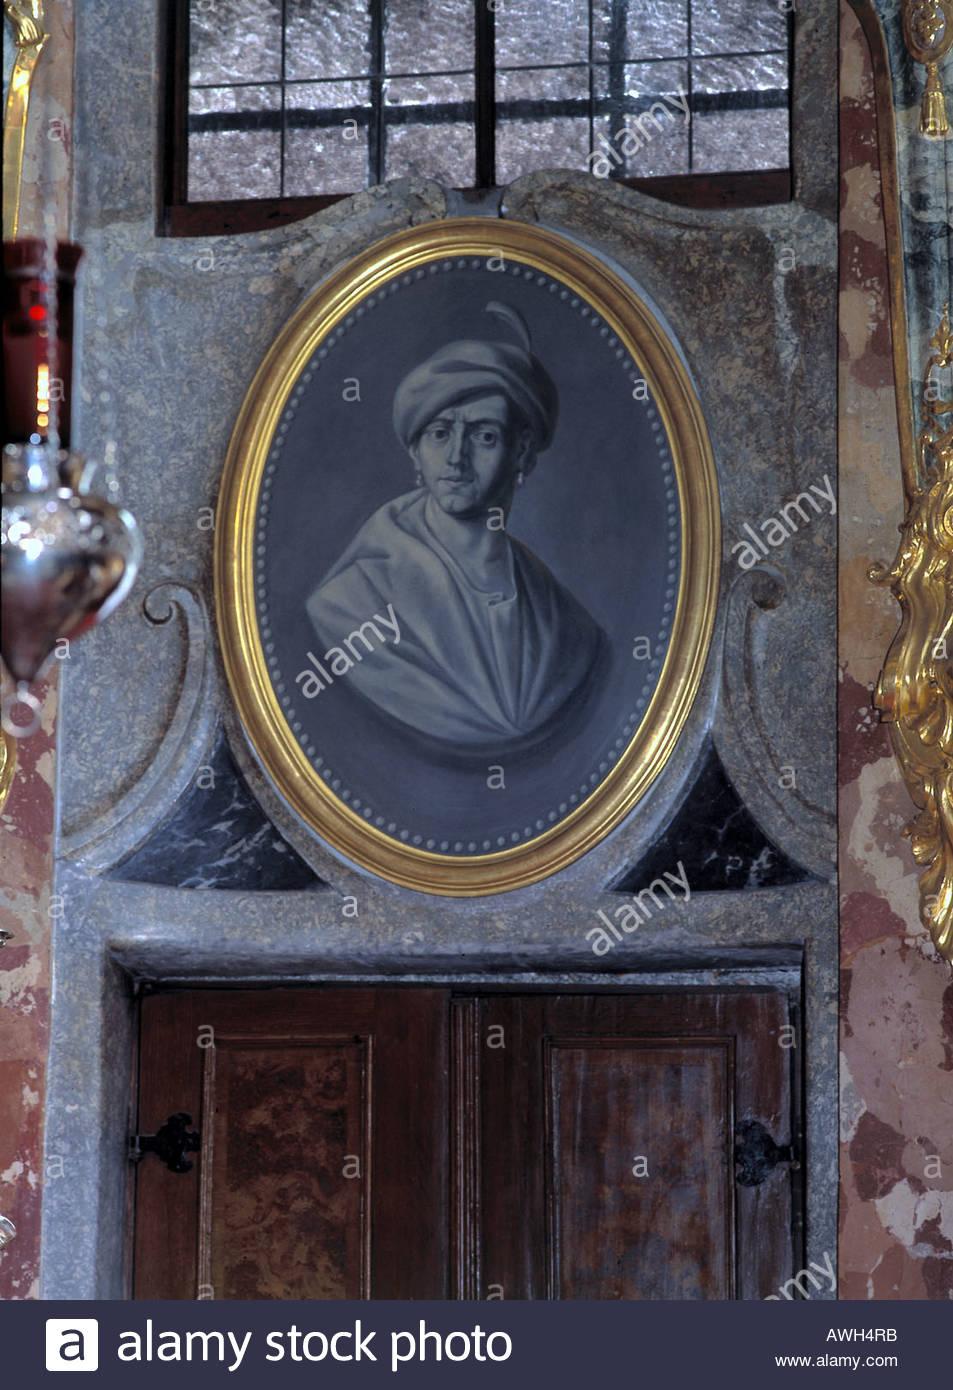 Germany, Bavaria, Asamkirche, portrait of Cosmas Damian Asam in presbytery - Stock Image